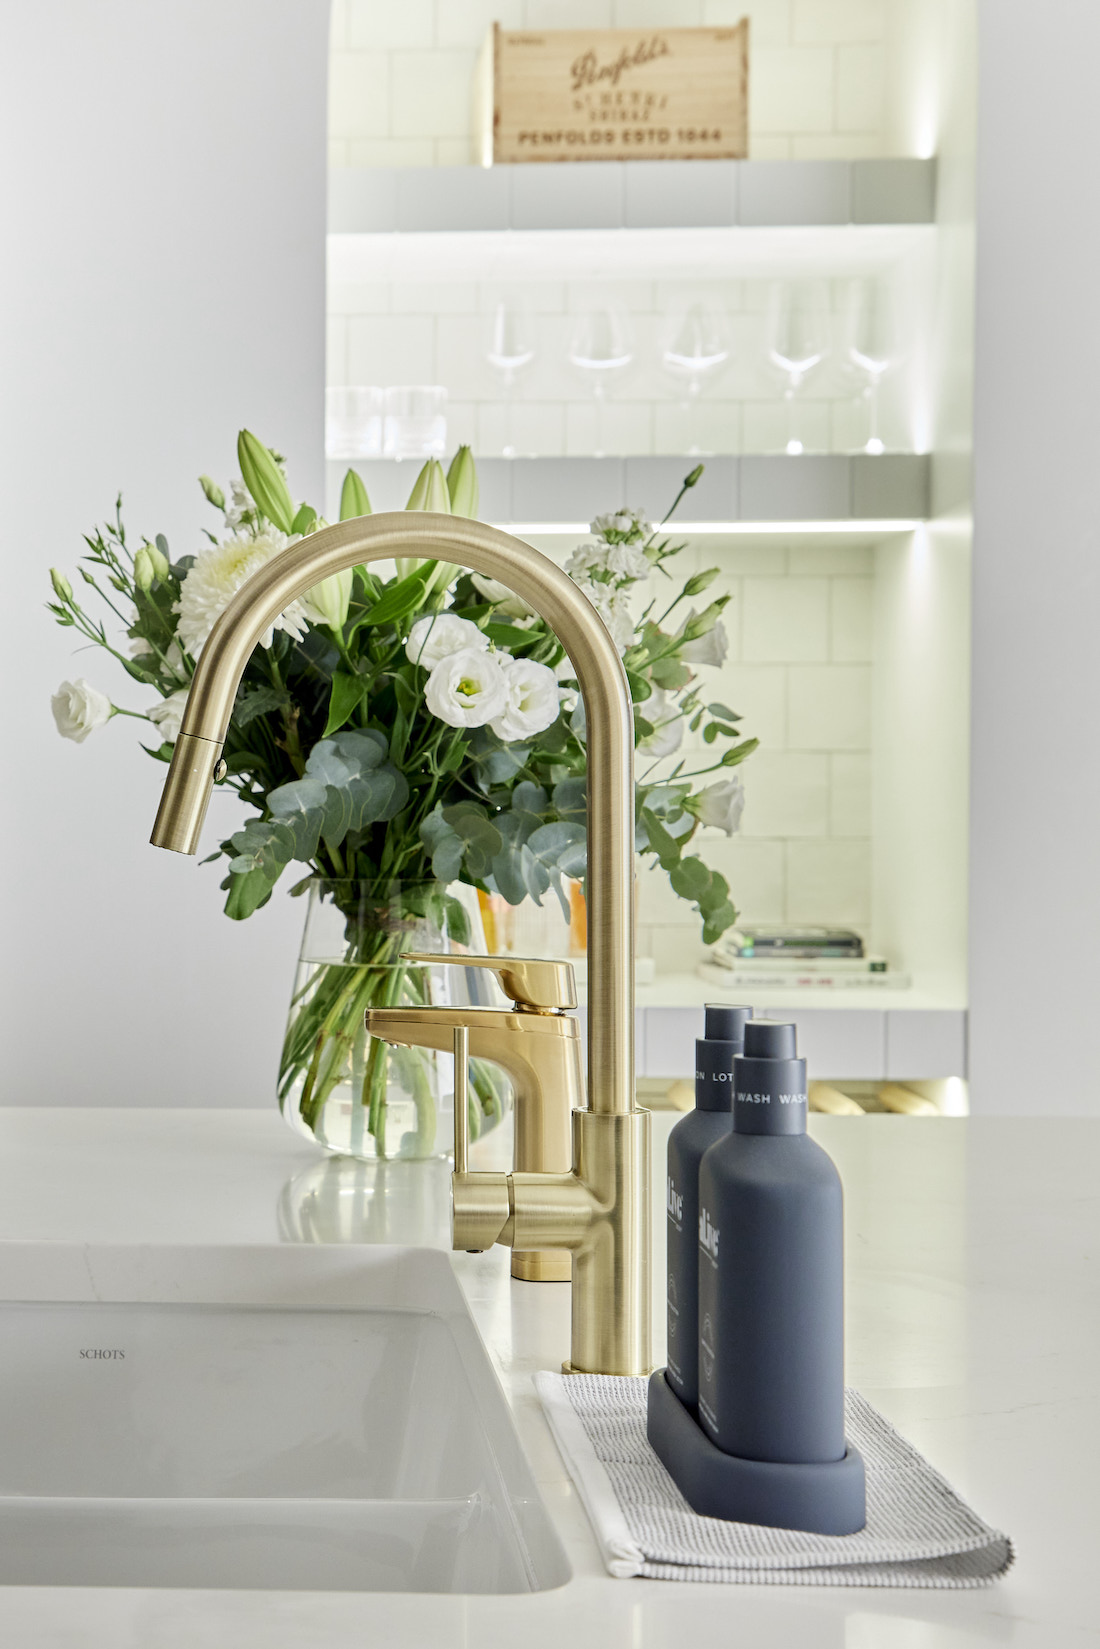 Gold gooseneck kitchen tap